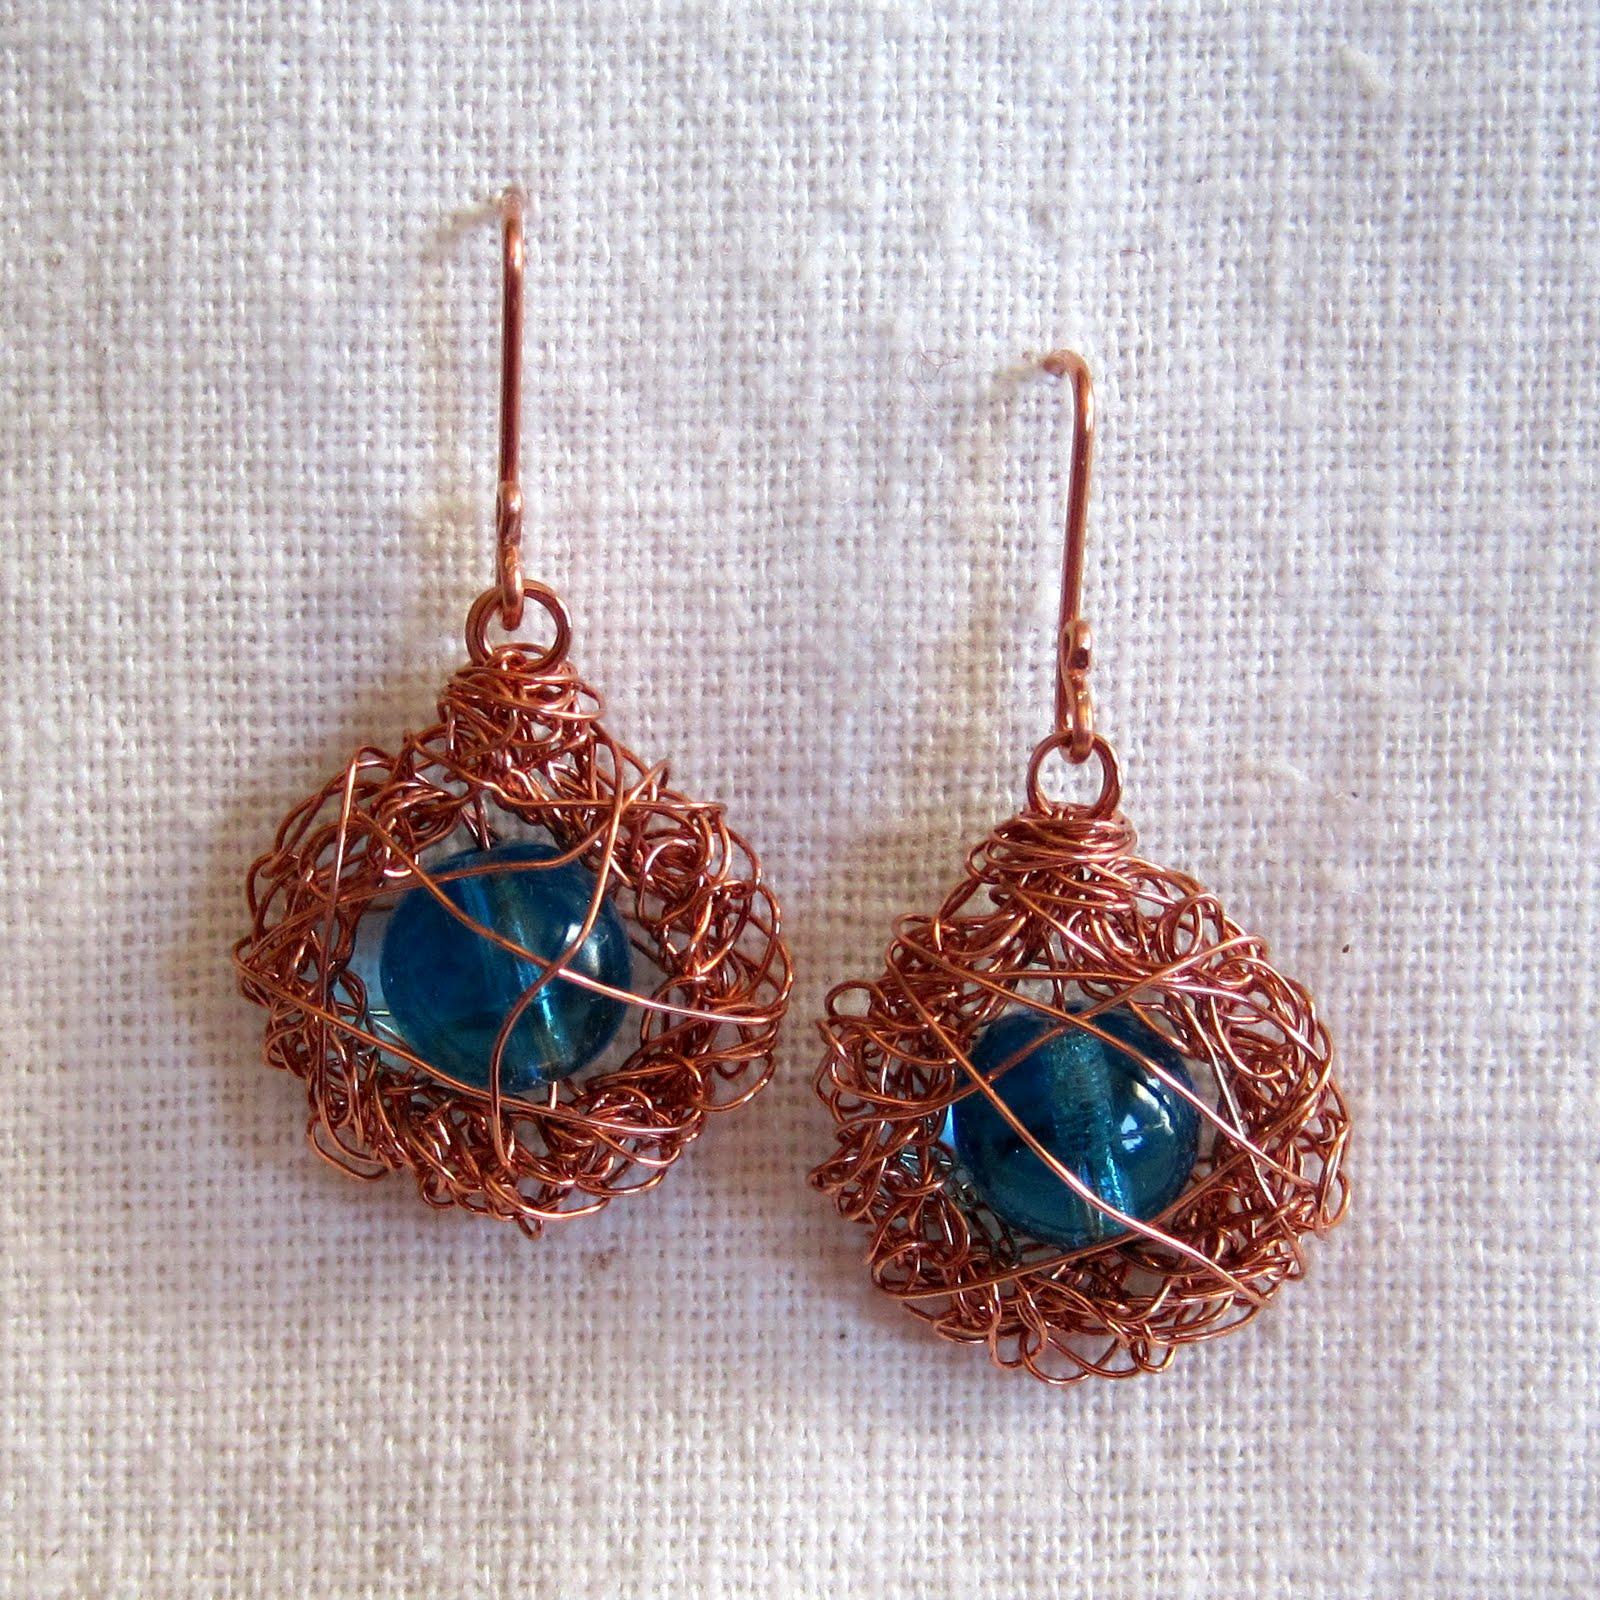 Crochet Hook Earrings: Mr. Micawber's Recipe For Happiness: Bird's Nest Wire